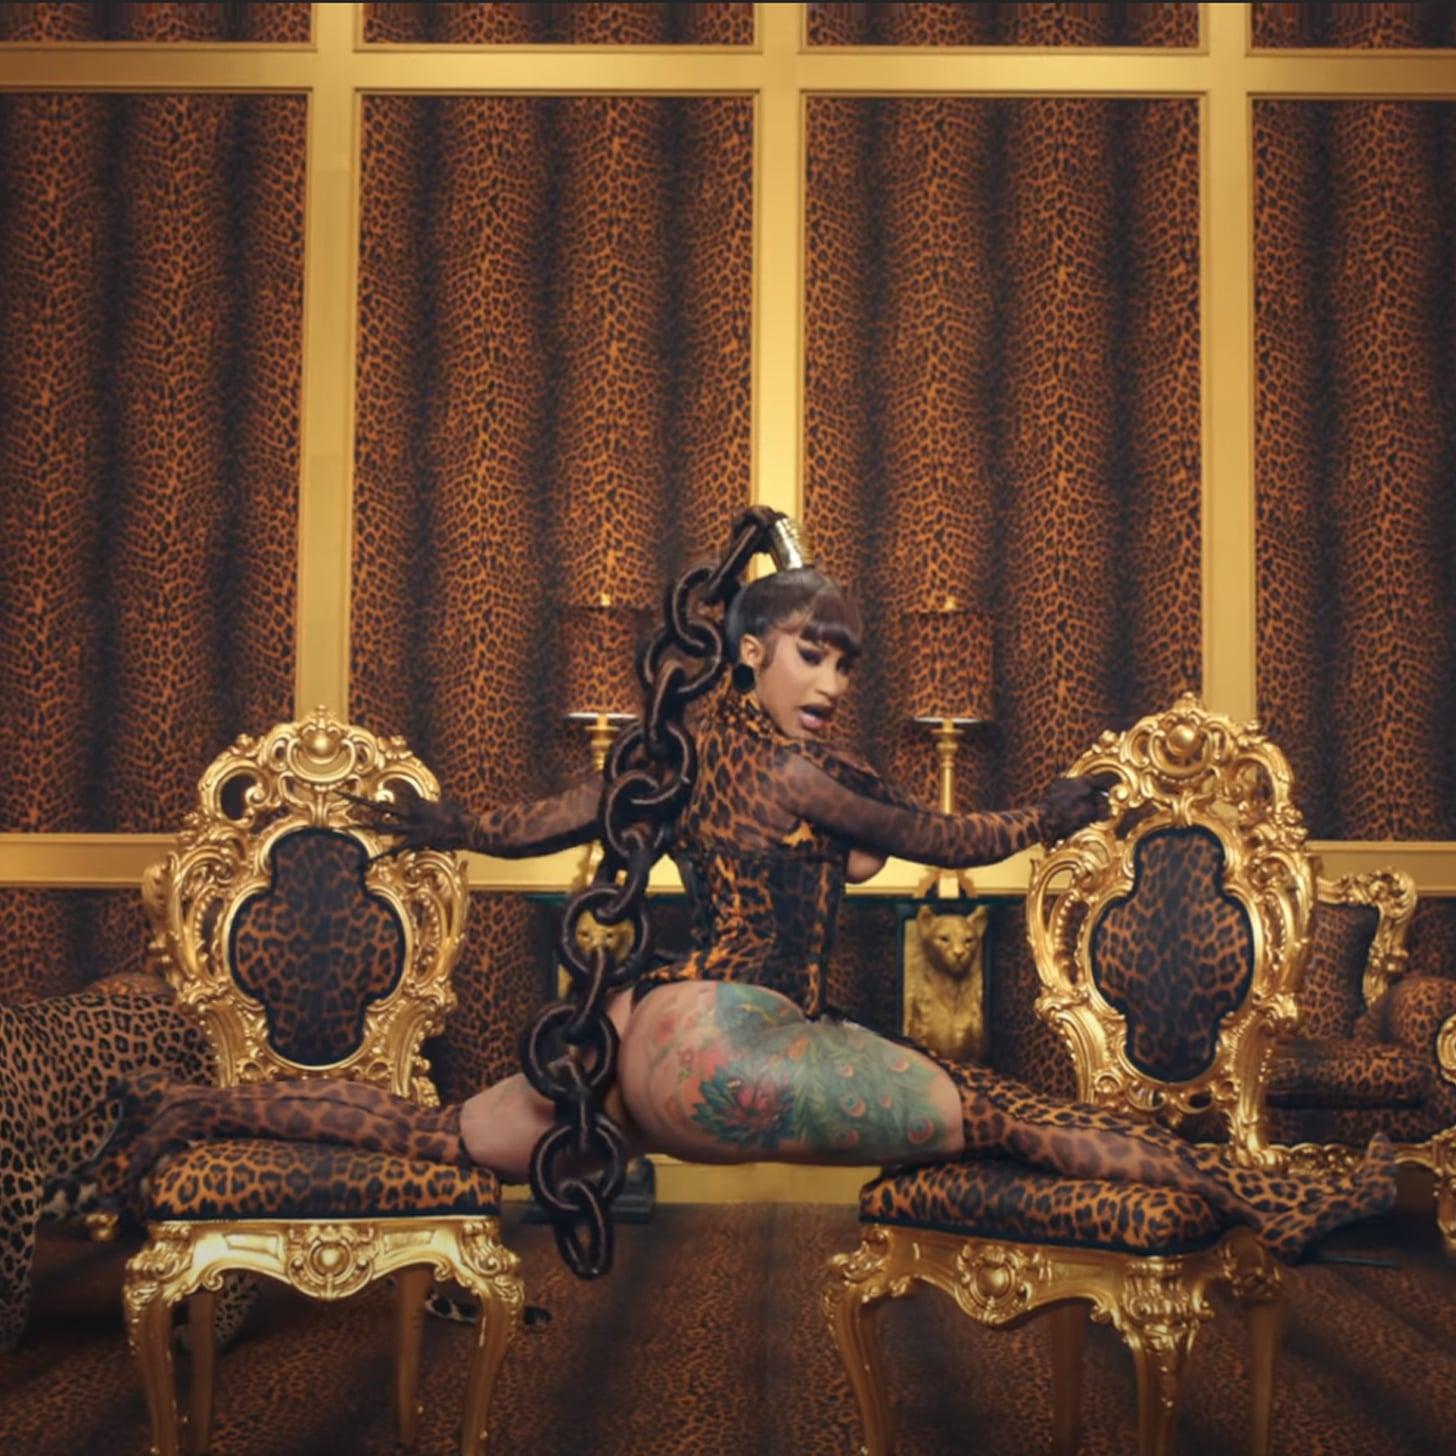 Cardi B And Megan Thee Stallion Wap Music Video Beauty Looks